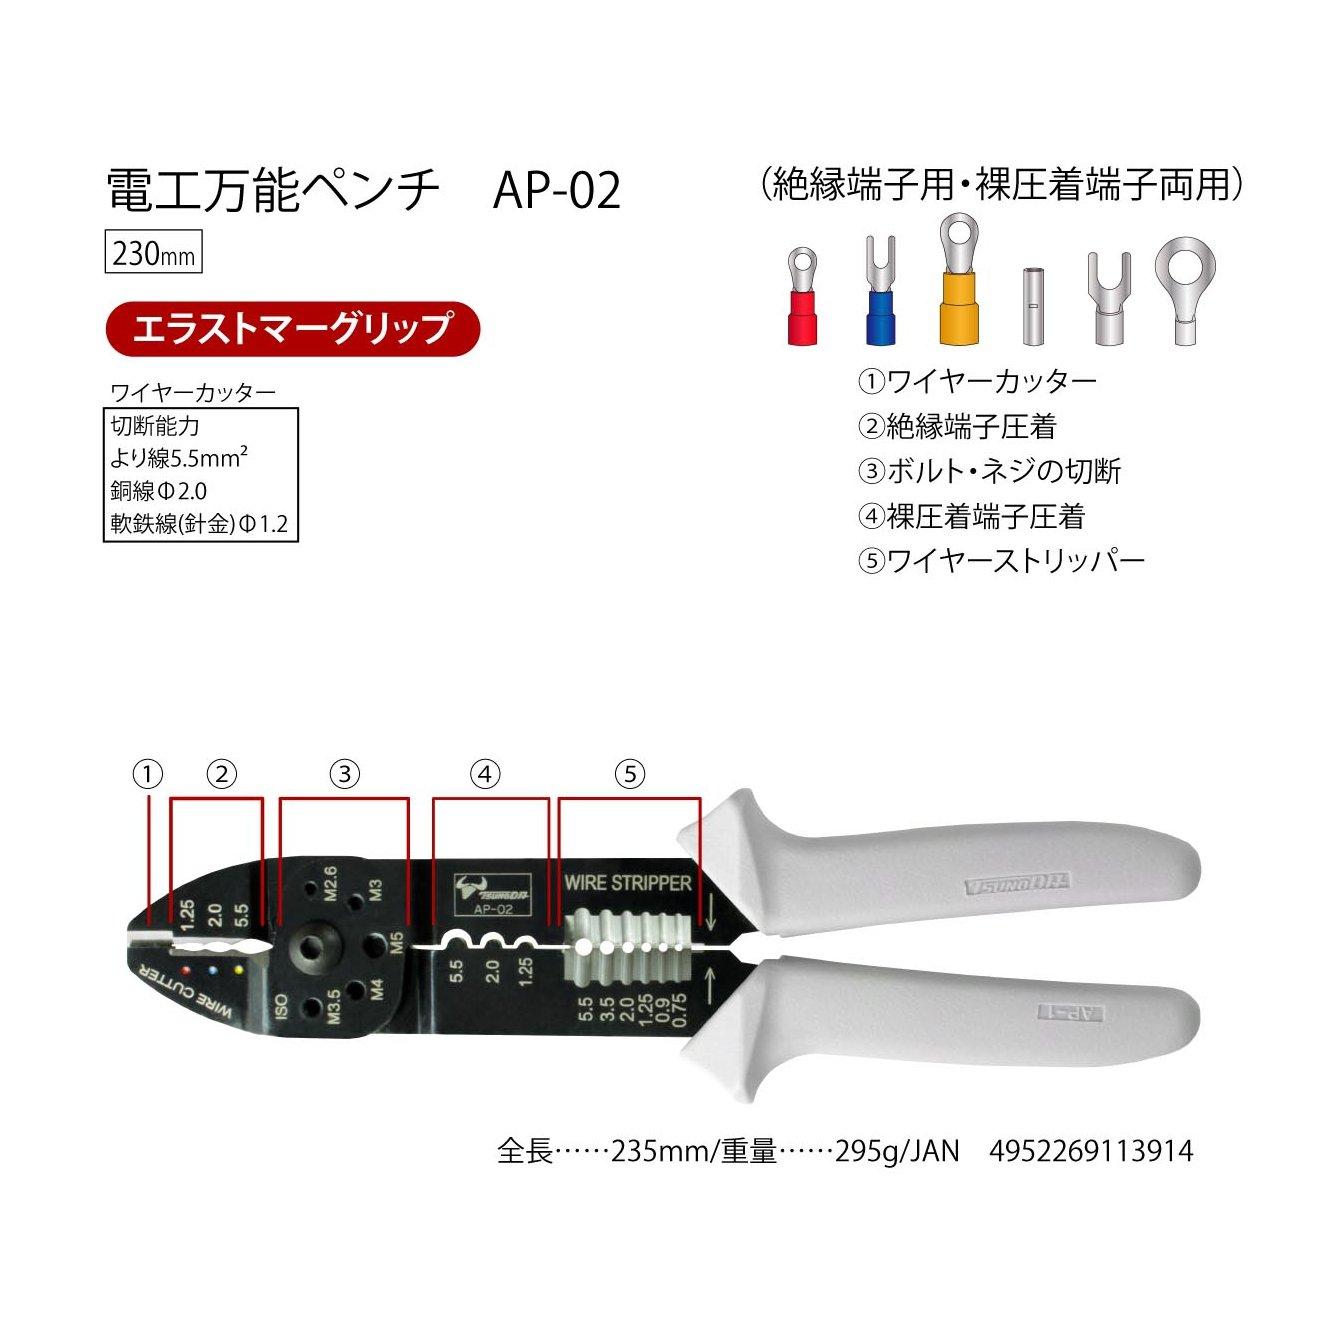 Kìm Tsunoda AP-02